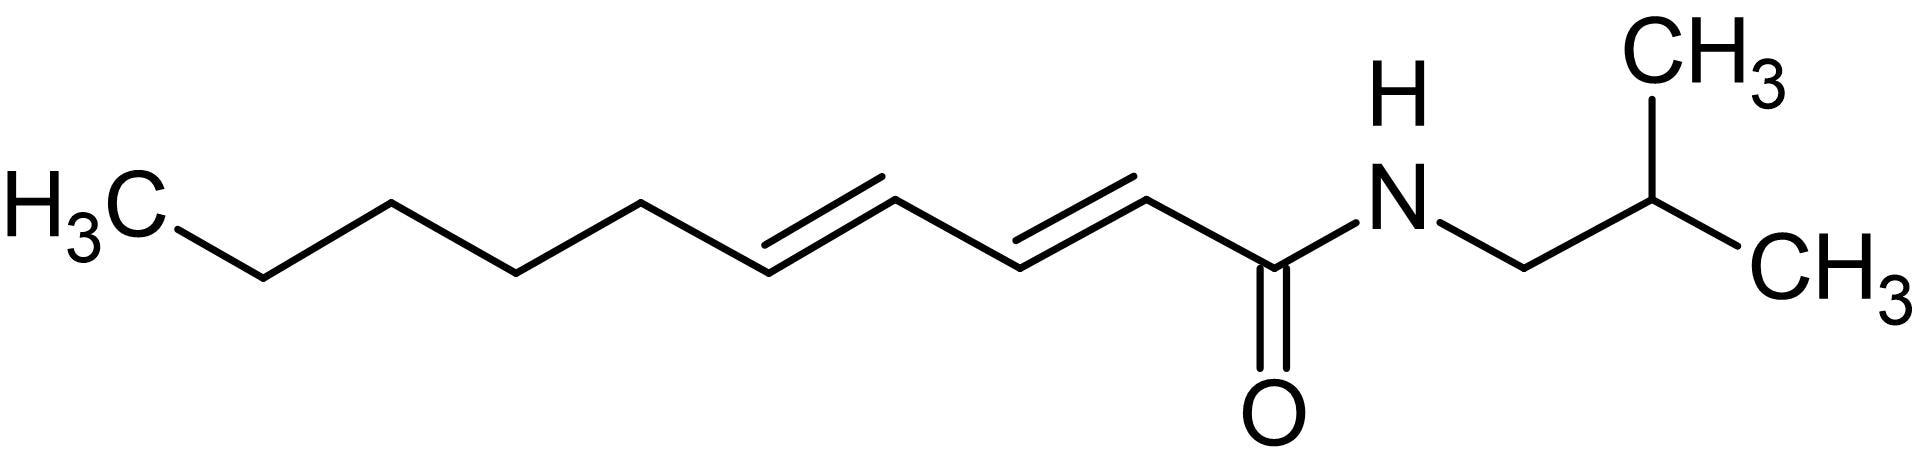 Chemical Structure - Pellitorine, Acyl-CoA cholesteryl acyl transferase and alpha (ab141495)